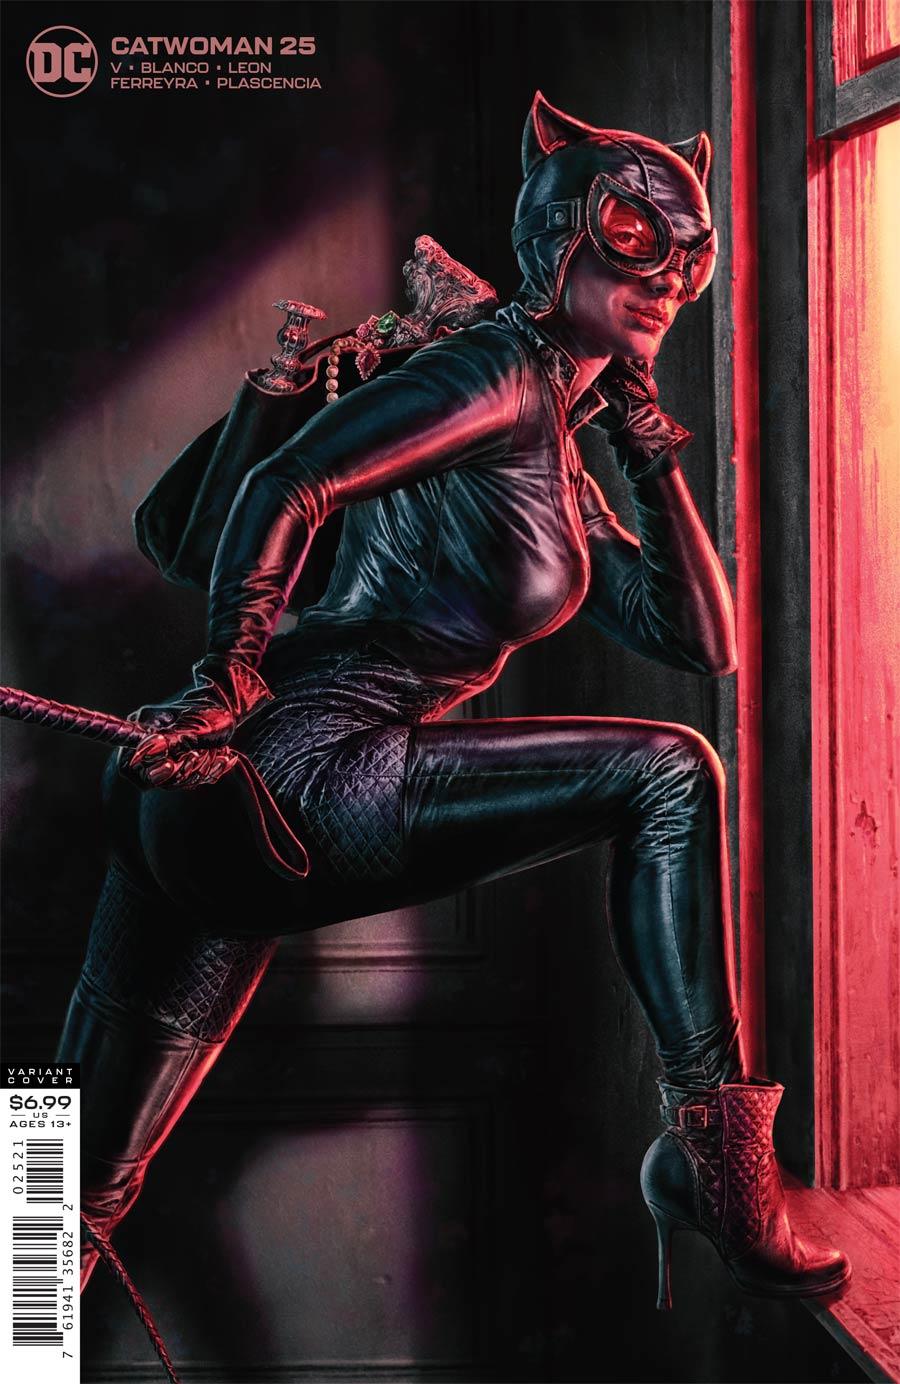 Catwoman Vol 5 #25 Cover B Variant Lee Bermejo Card Stock Cover (Joker War Tie-In)